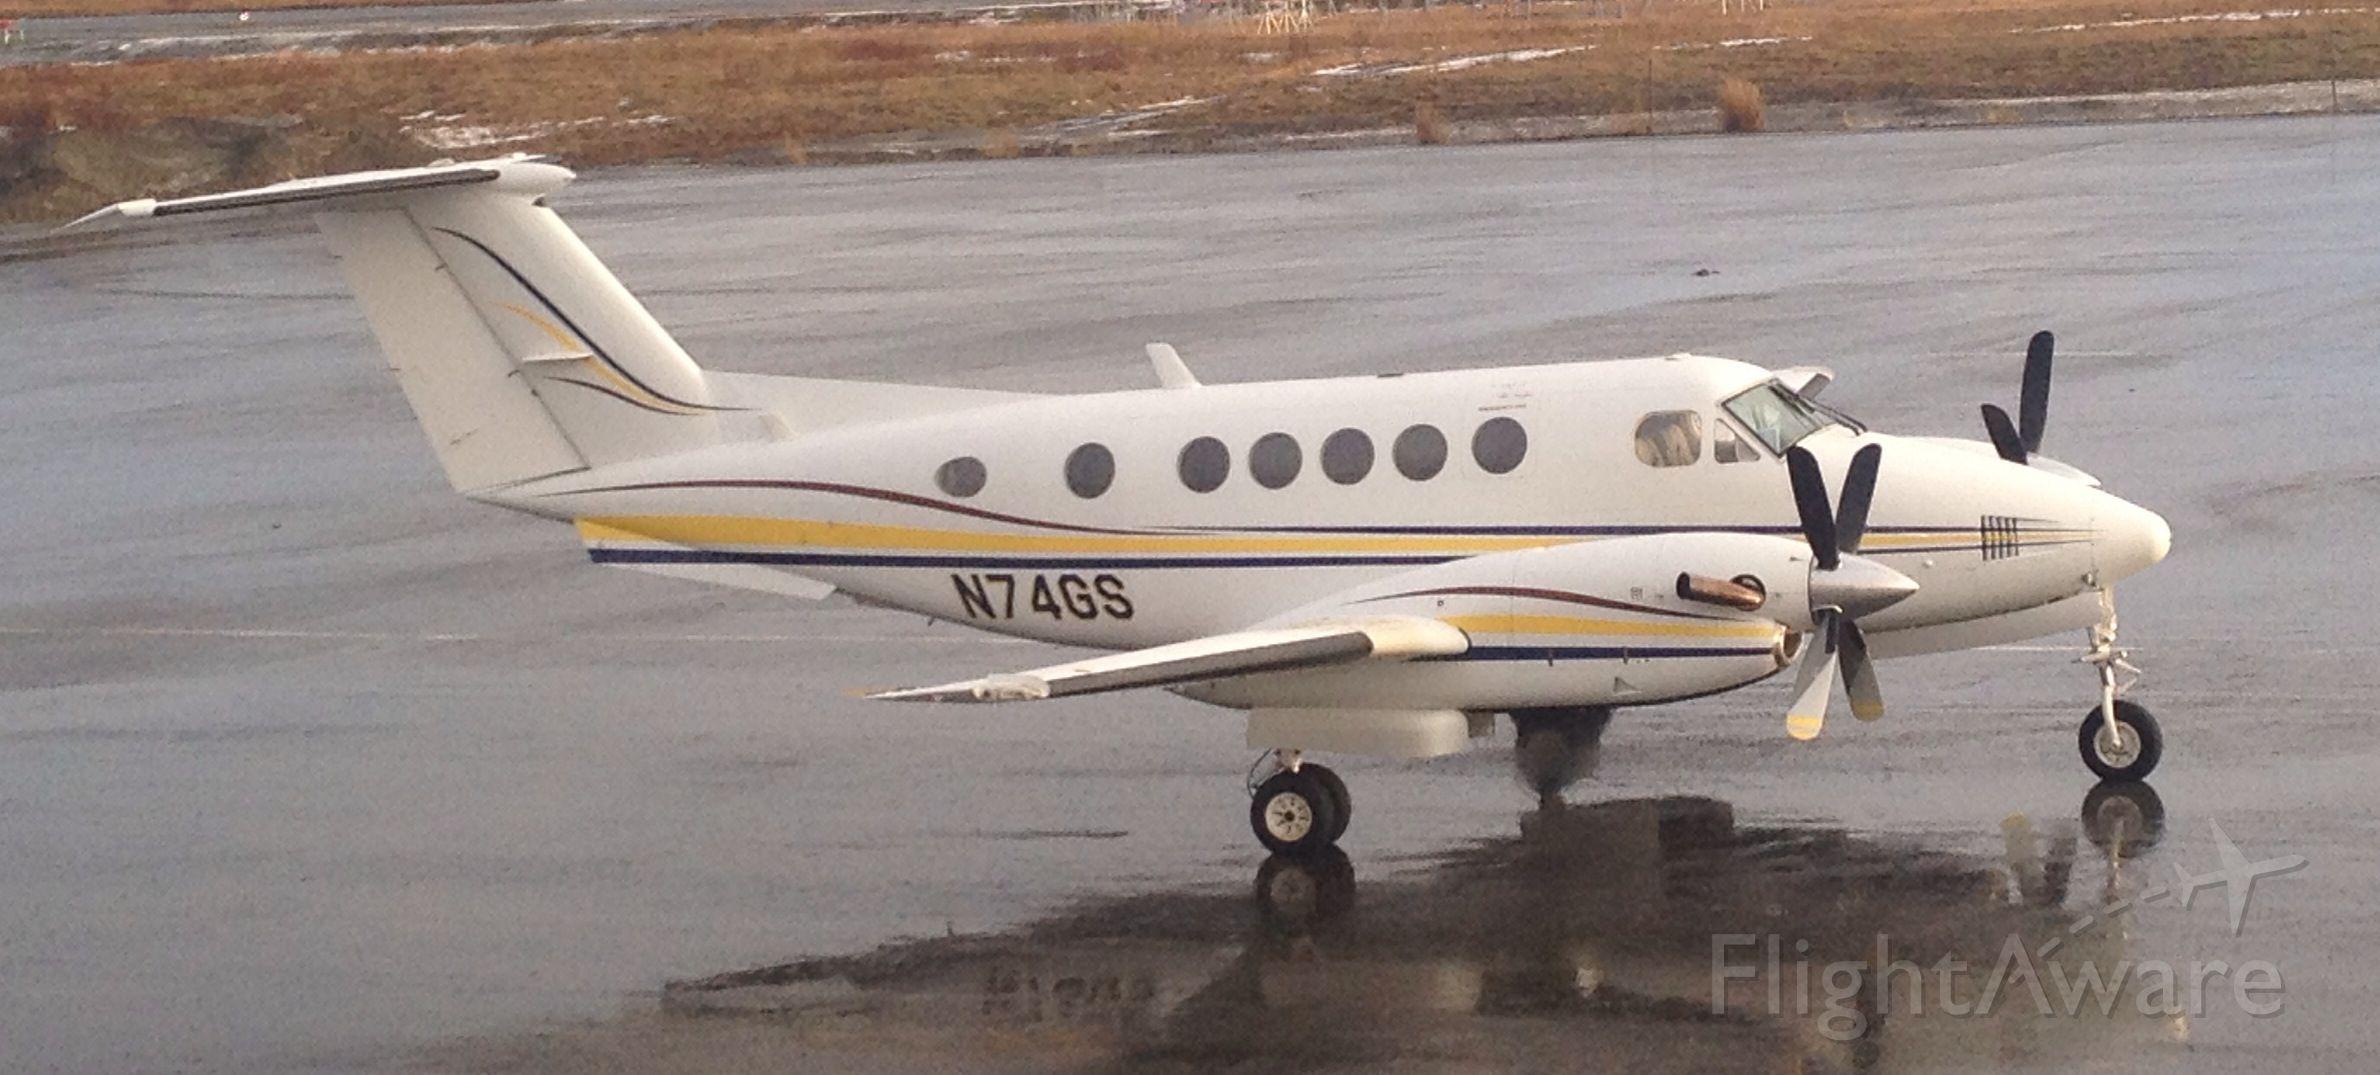 Beechcraft Super King Air 200 (N74GS)